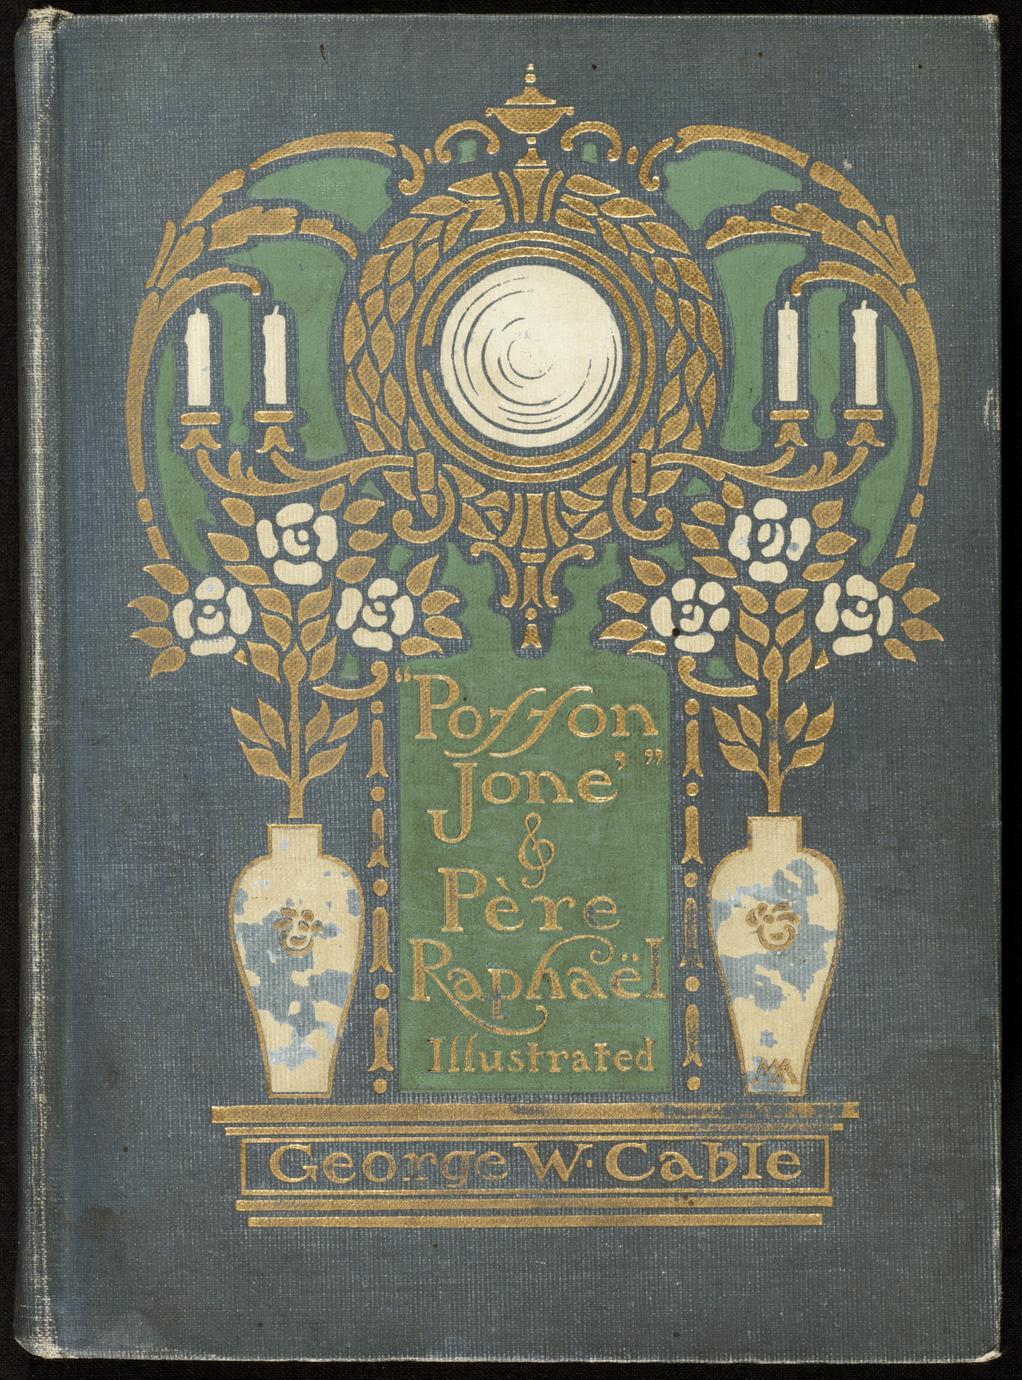 """Posson Jone'"" and Père Raphaël (1 of 3)"